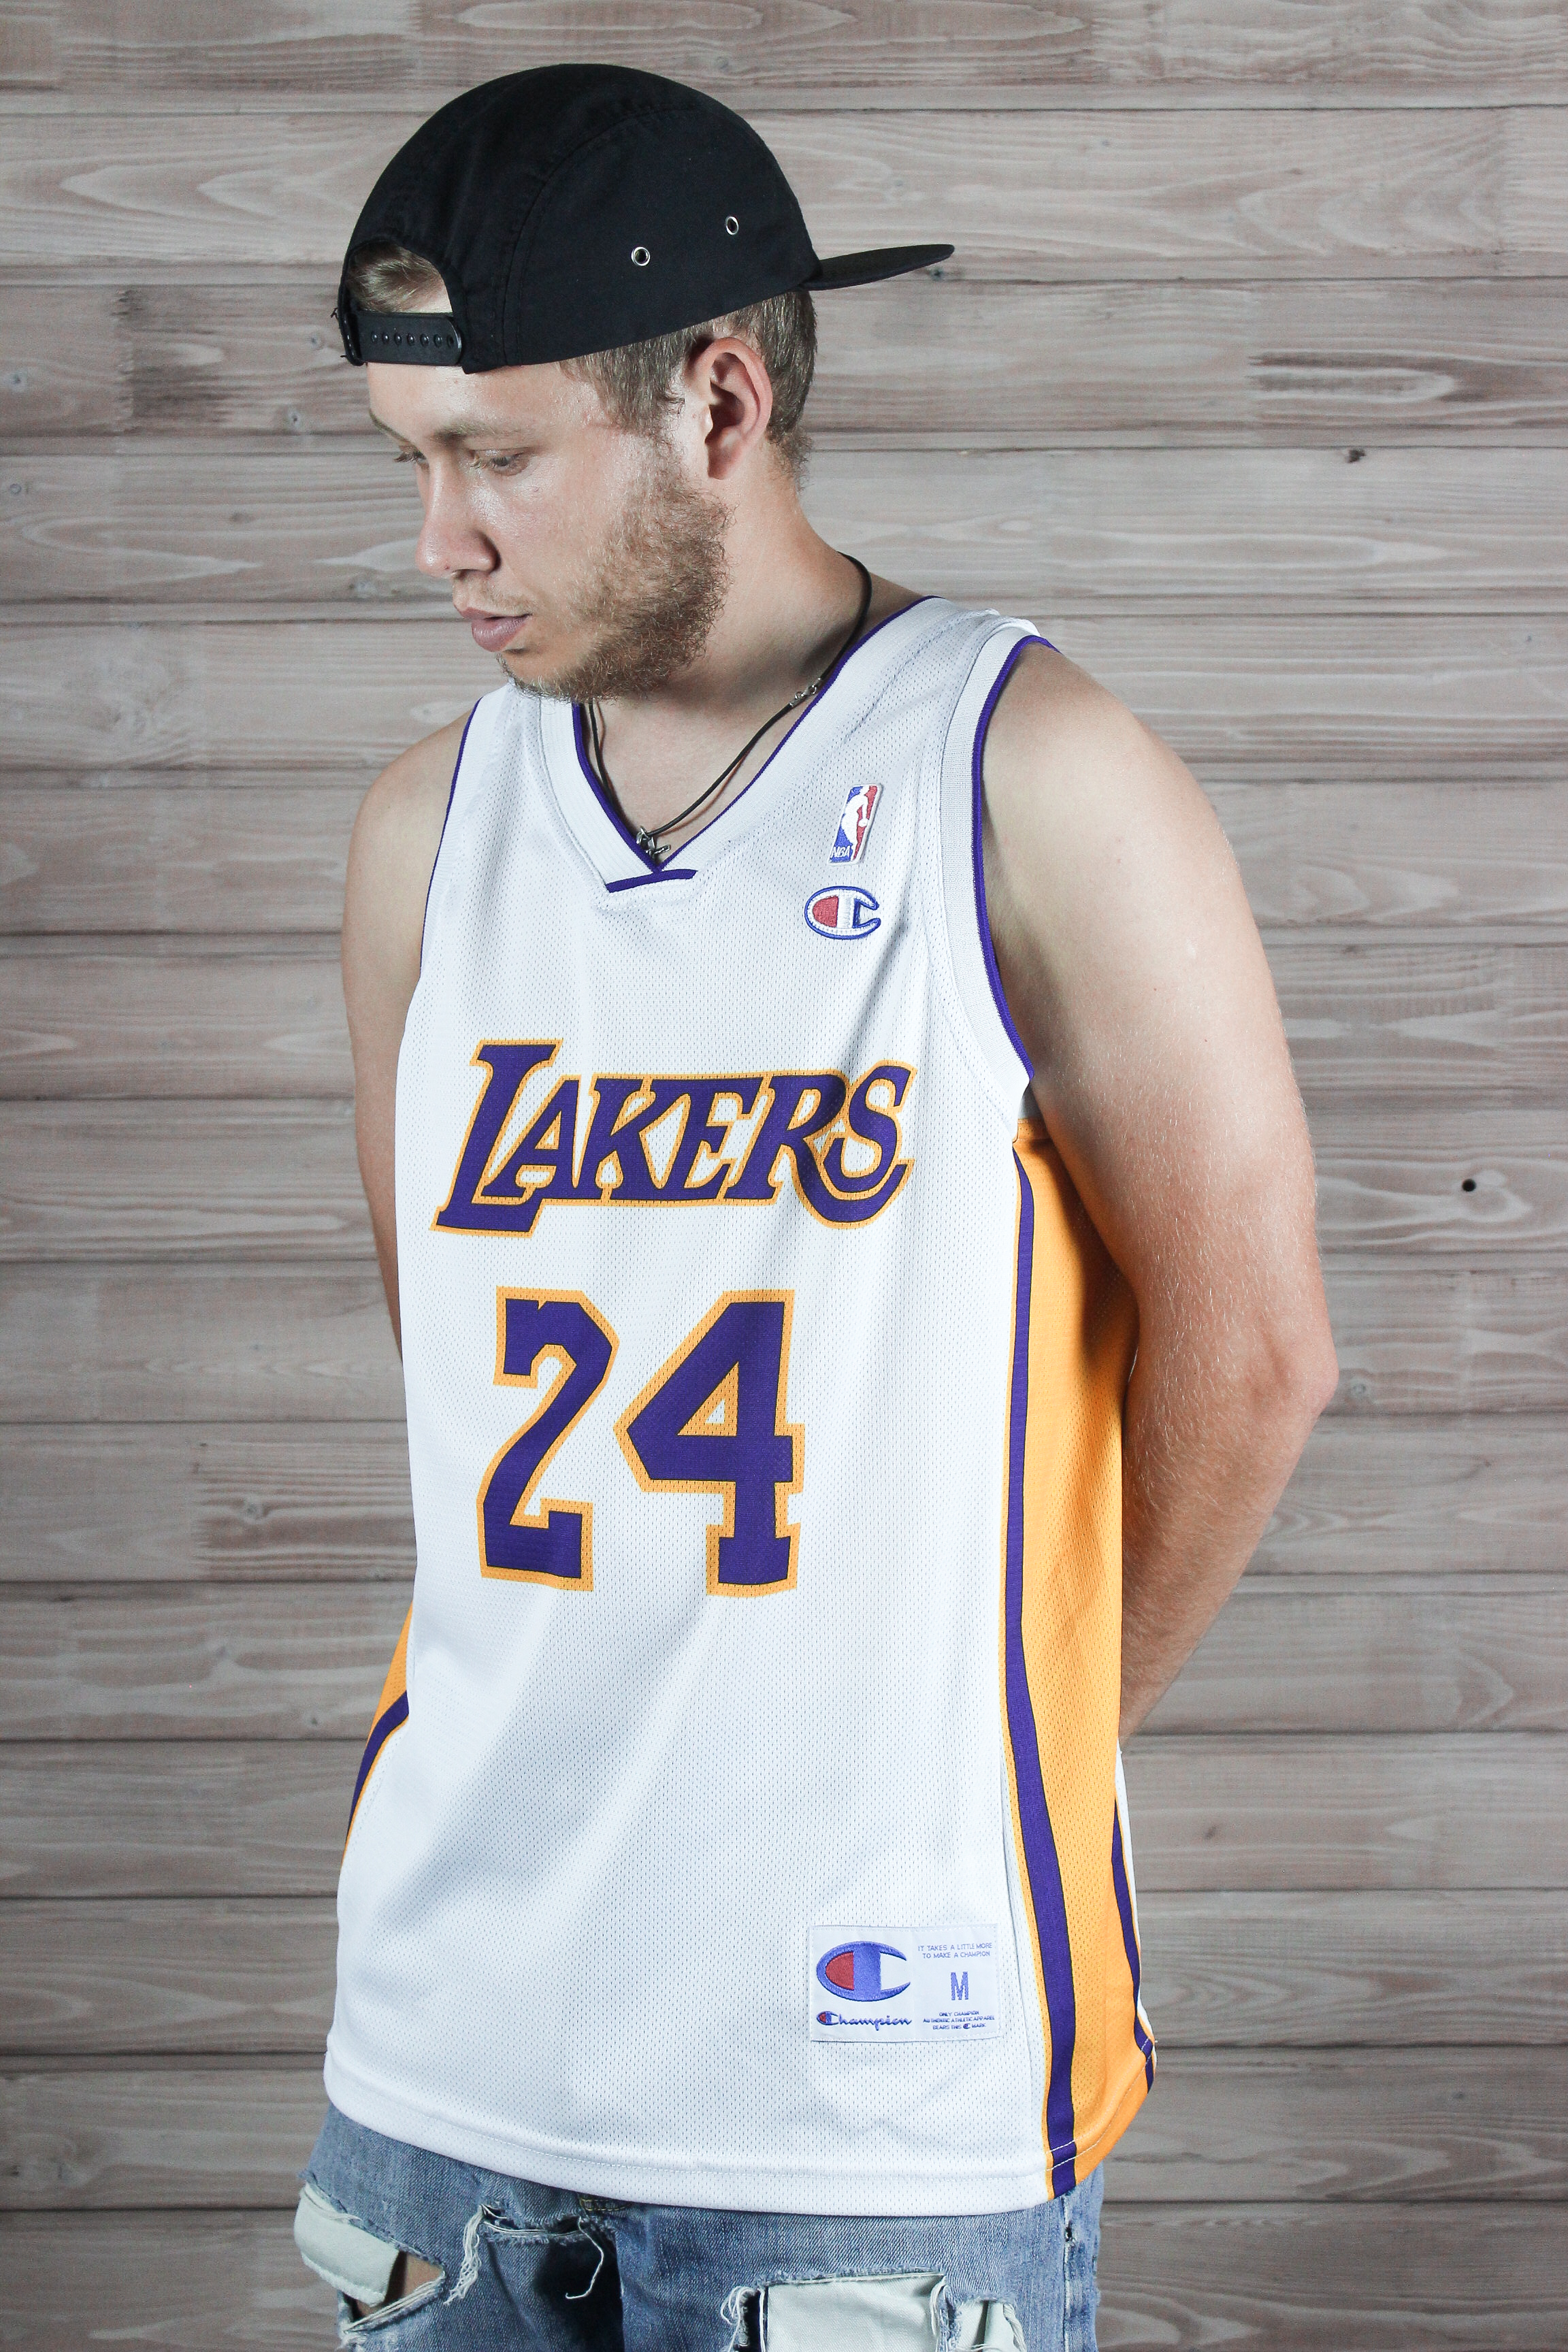 eeb73049ec1 Champion Vintage Mens Champion 24 Lakers Kobe Bryant Jersey | Grailed